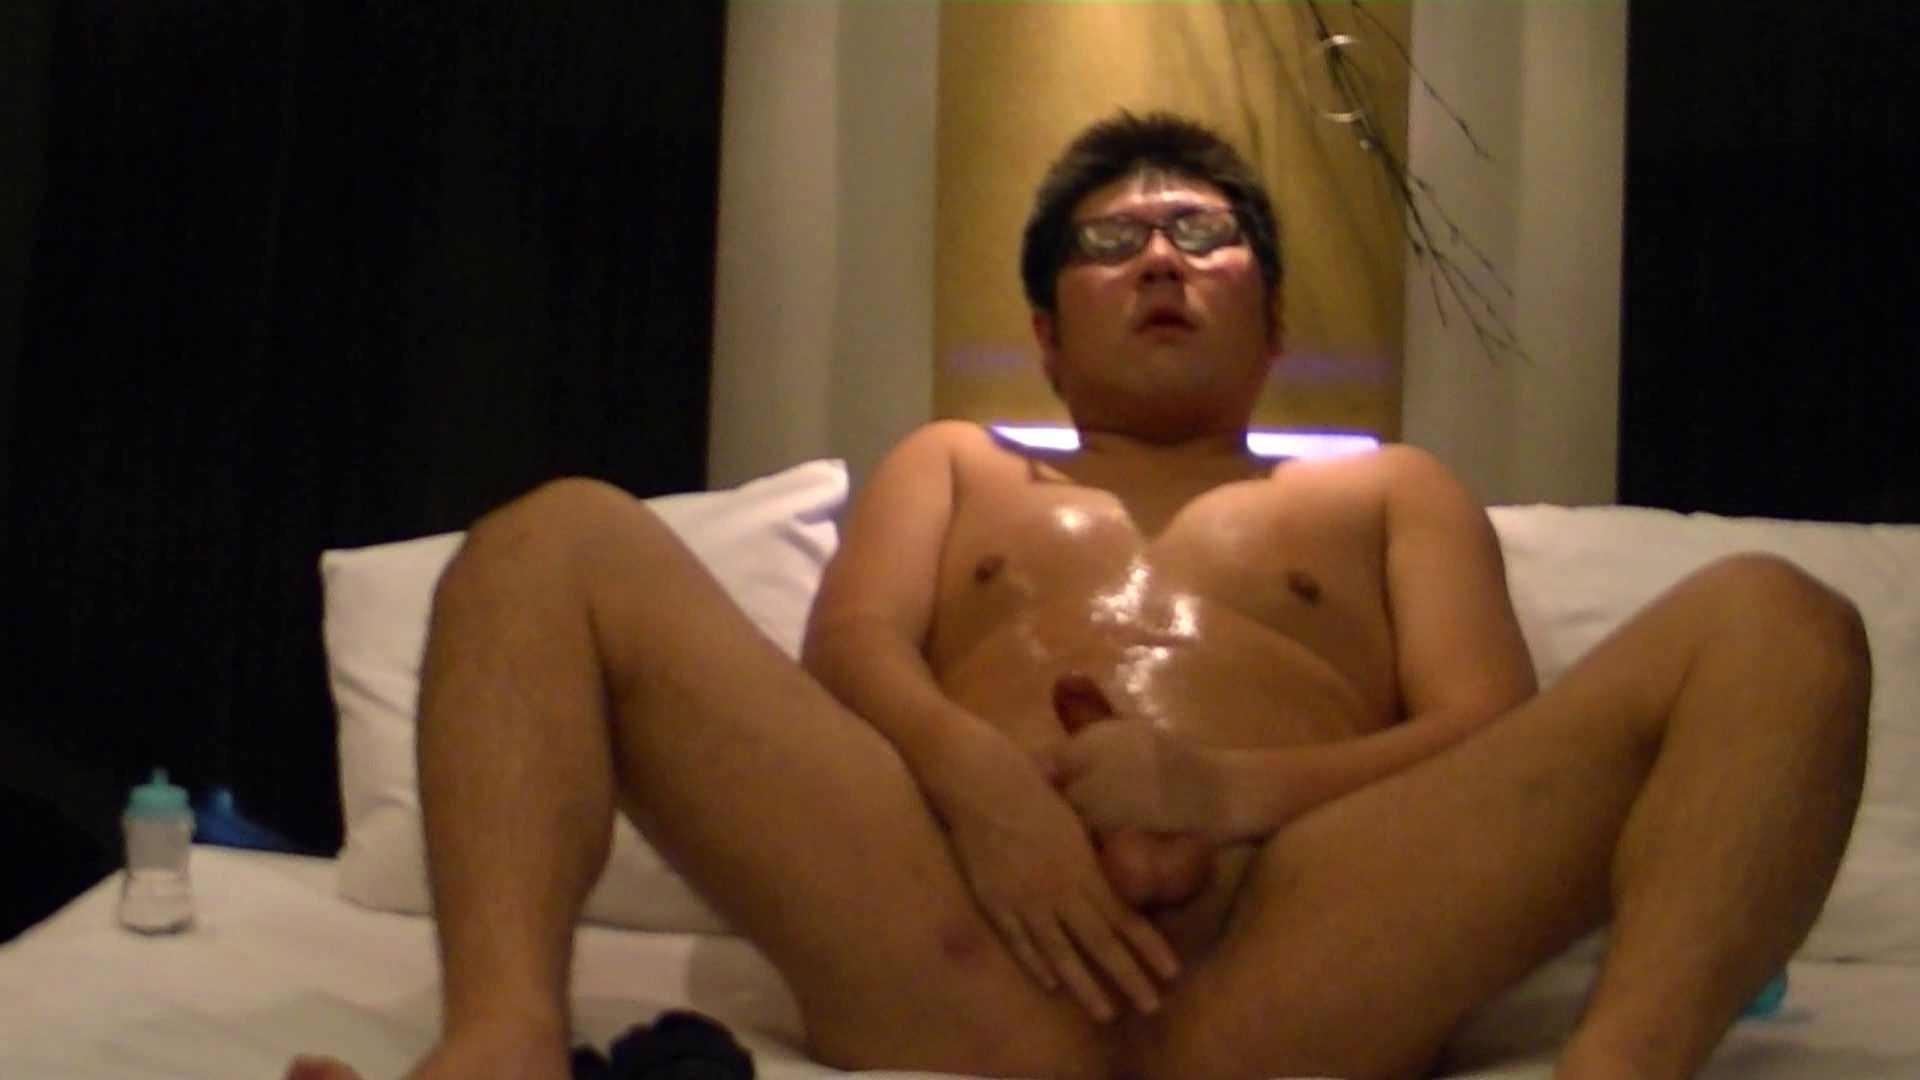 Mr.オナックスさん投稿!HD 貴方のオナニー三万円で撮影させてください。VOL.03 後編 完全無修正でお届け | オナニー特集  83pic 1